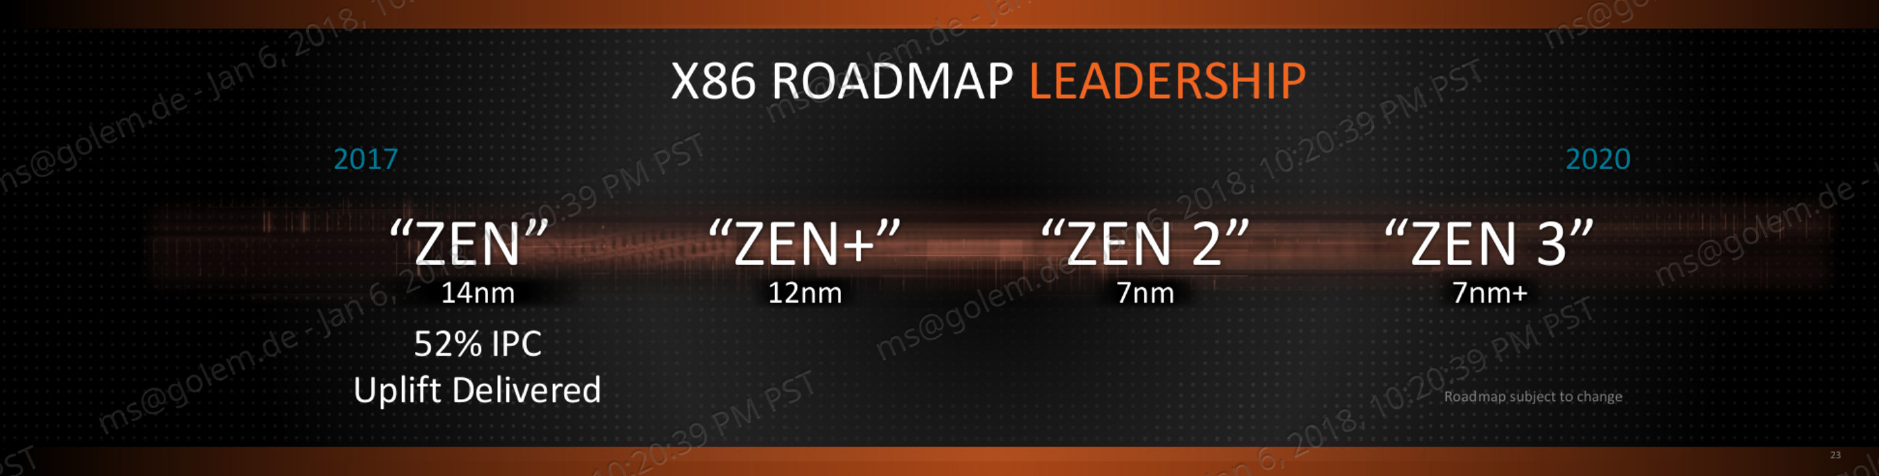 Pinnacle Ridge: Ryzen 2000 und Zen 2/3 erklärt - Zen-Roadmap (Bild: AMD)